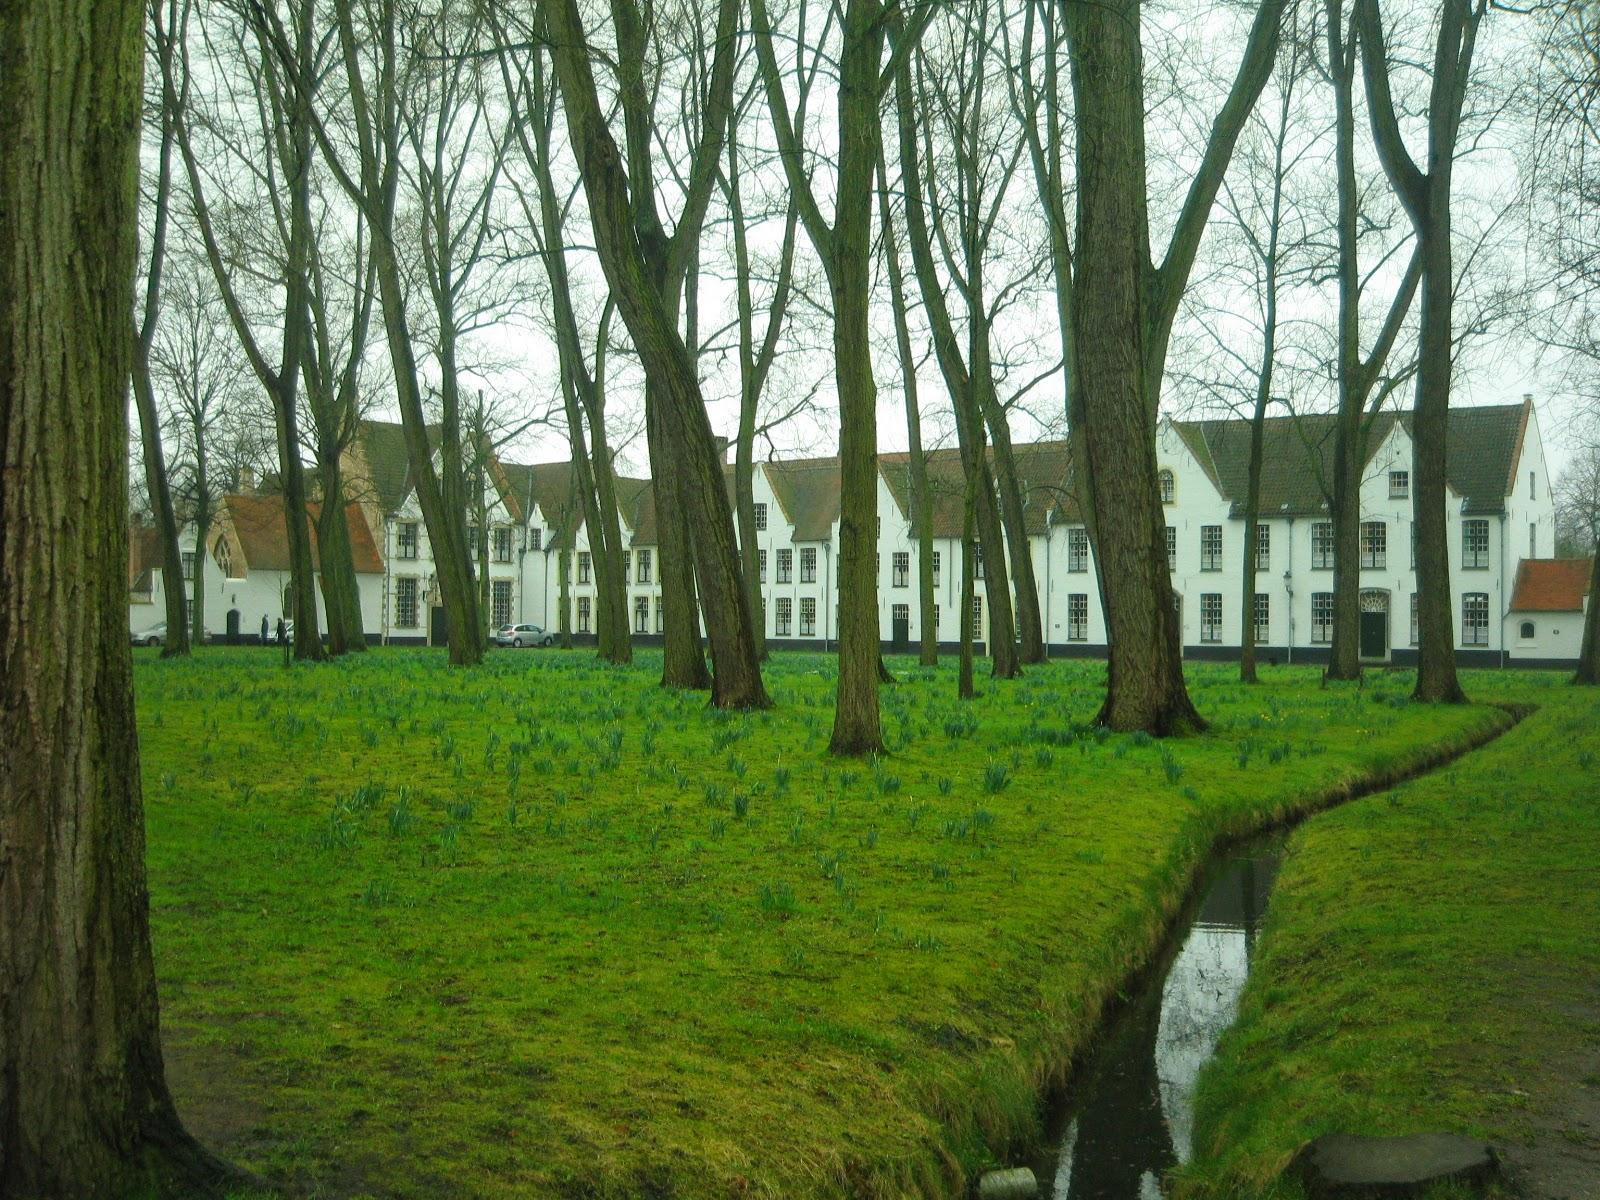 Begijnhof/Beguinaje en Brujas